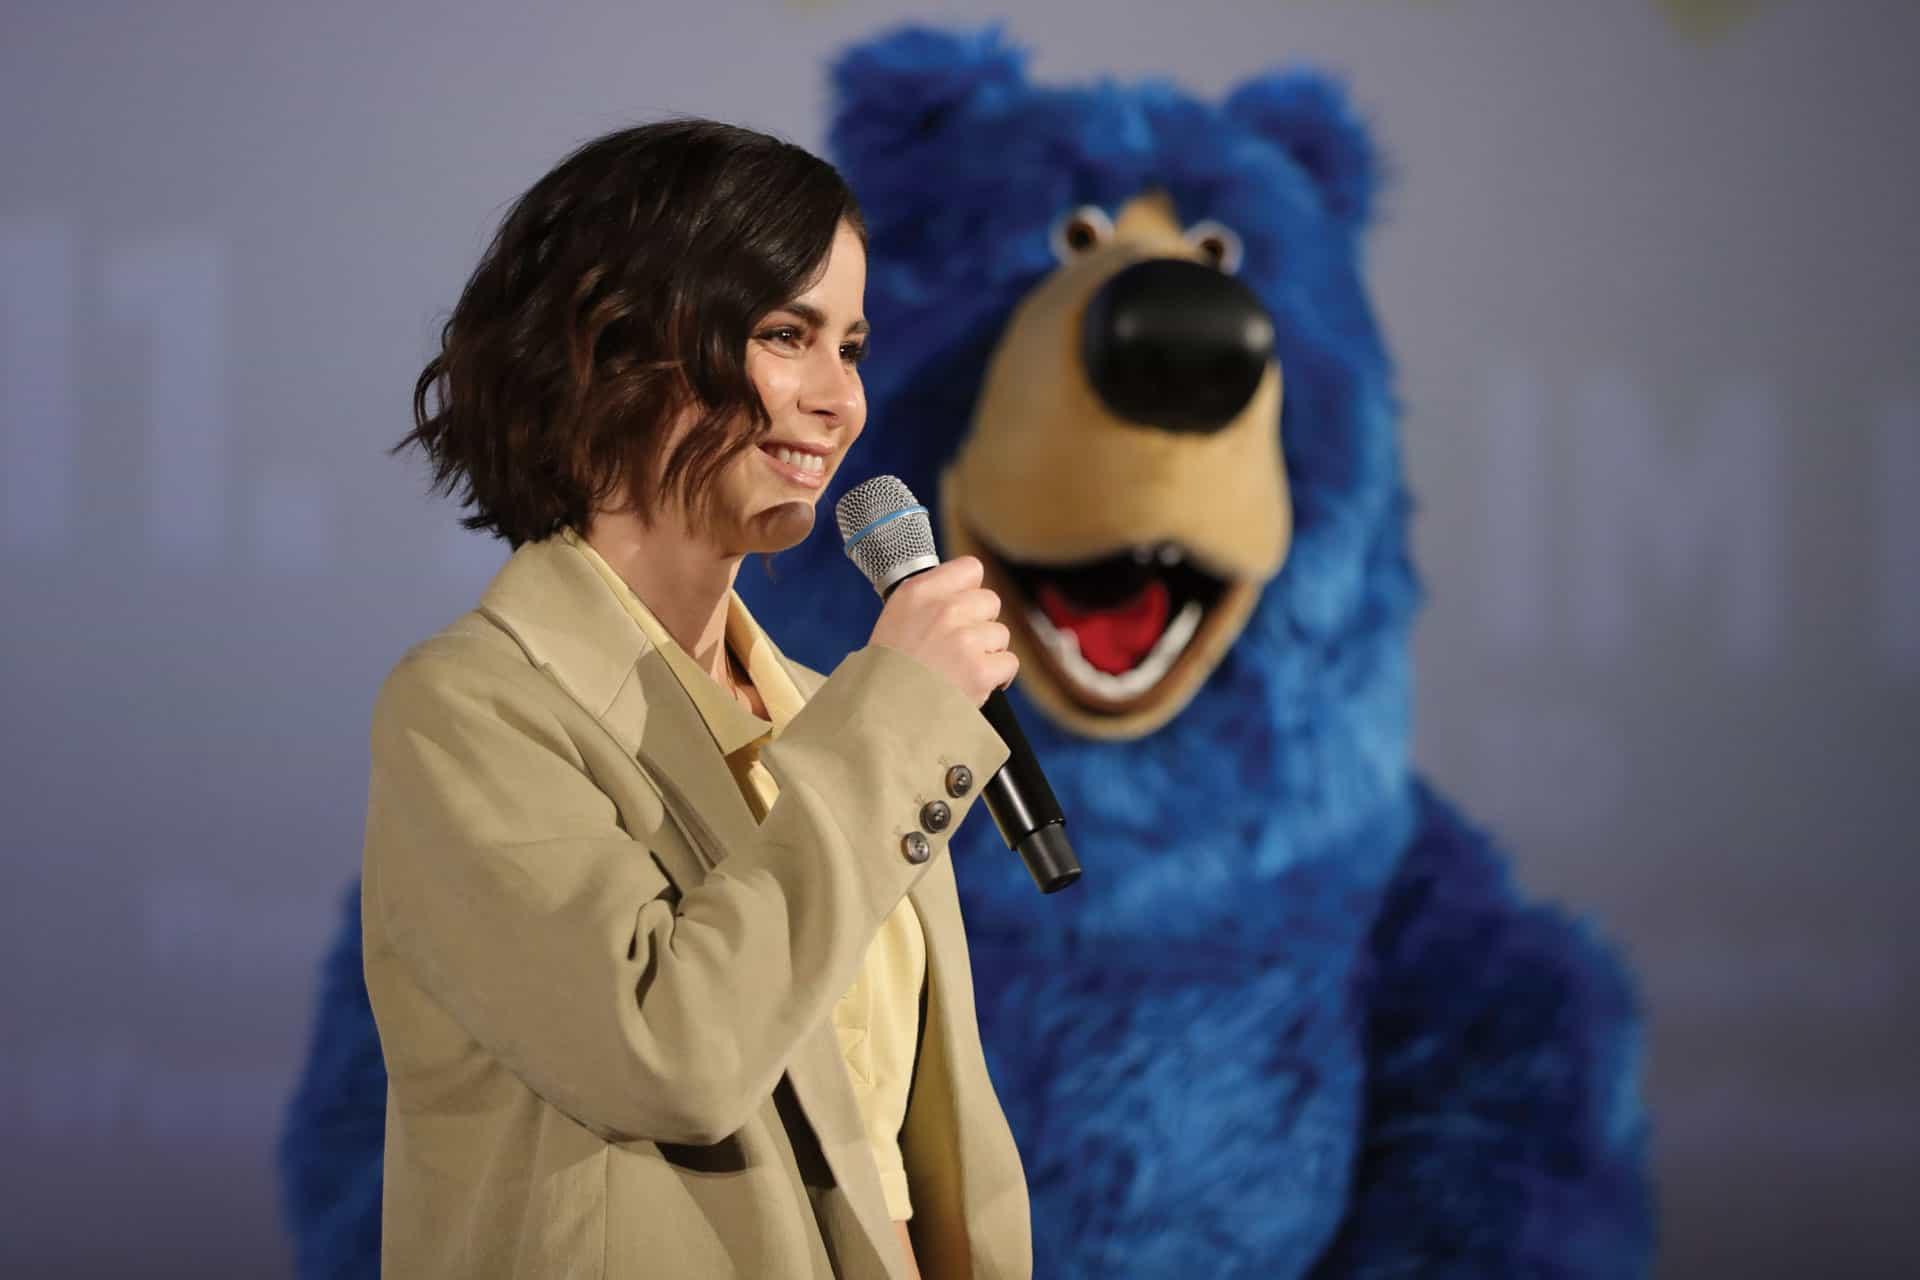 Lena Meyer-Landrut (c) Getty Images